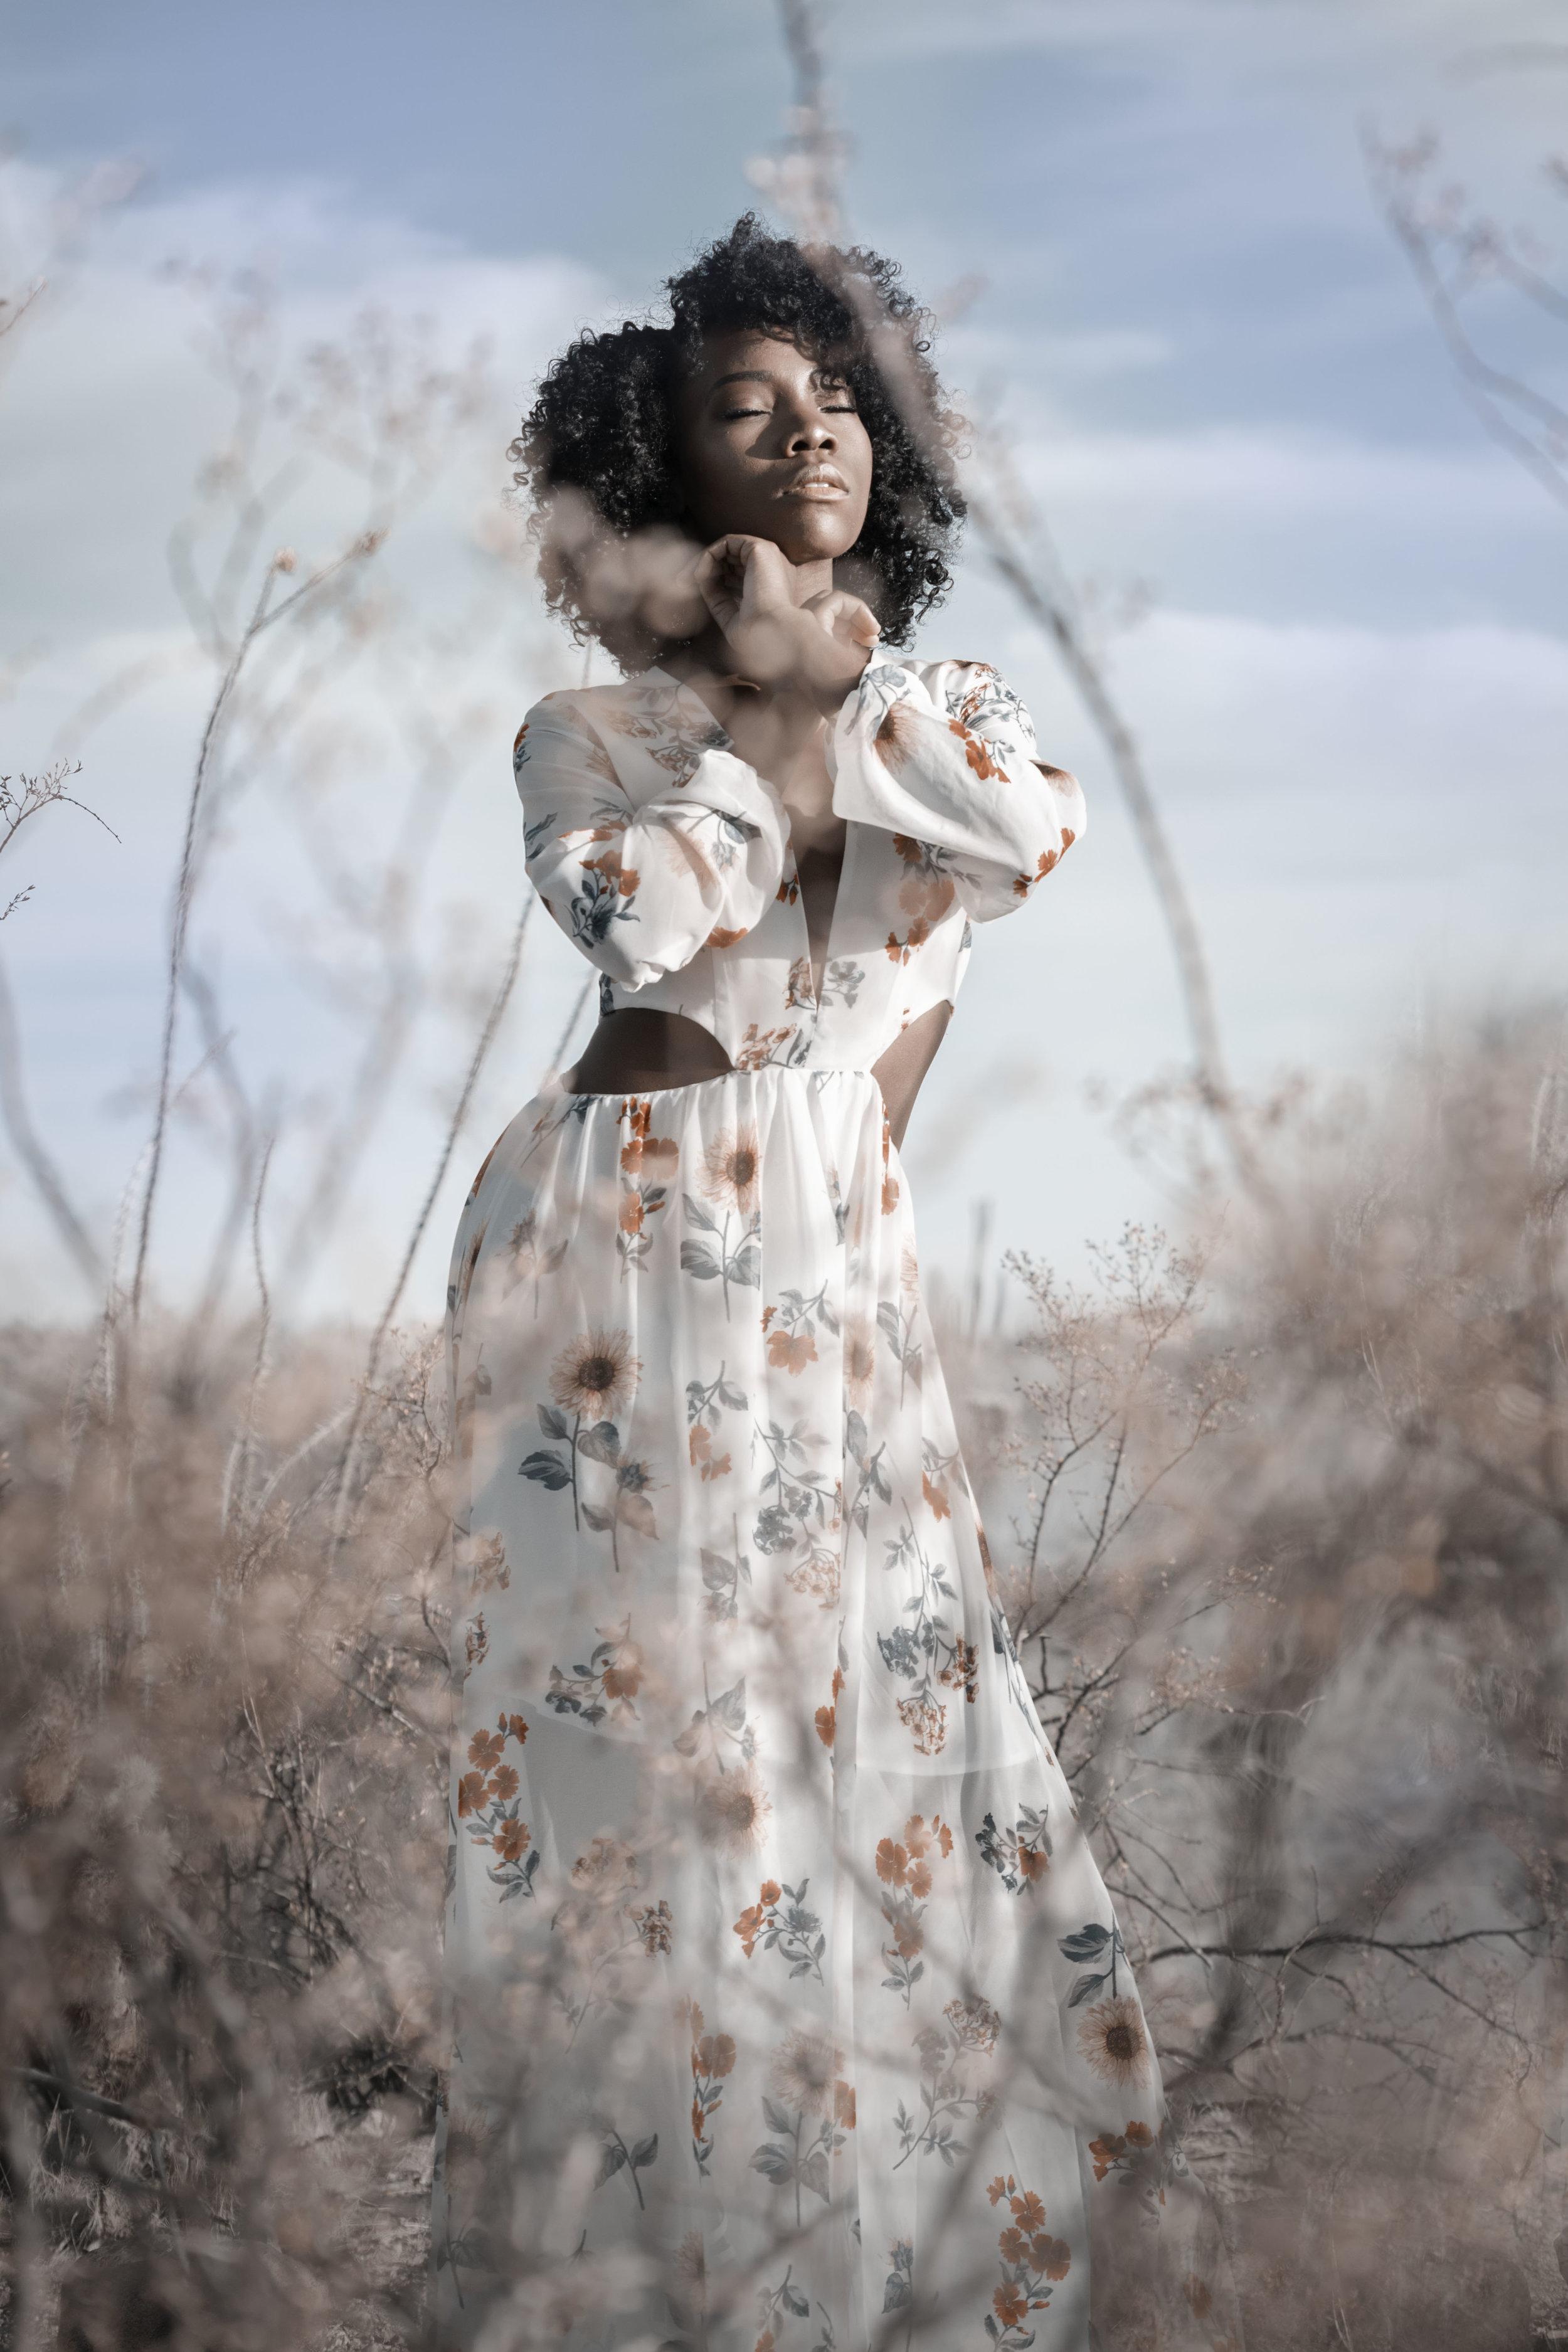 Photographer: Visual Creations (Alicia Villarreal)  Model: Joel   Hair & Makeup Artist: Faces By Amelia (Tanya Amelia White)